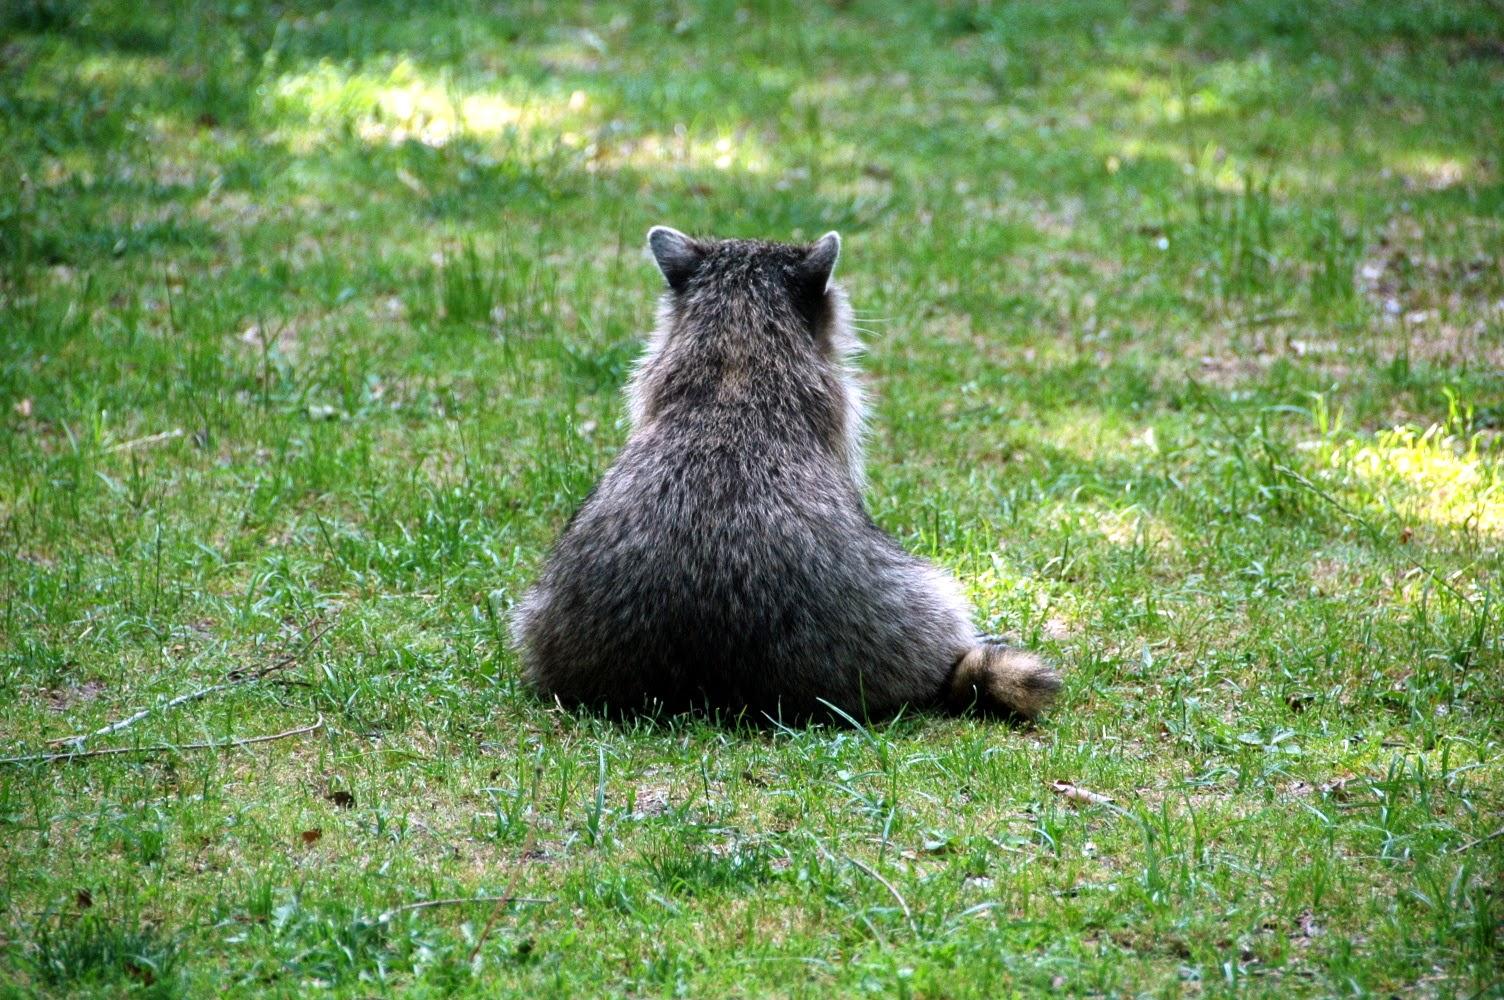 fat mama raccoon enjoying a sit in